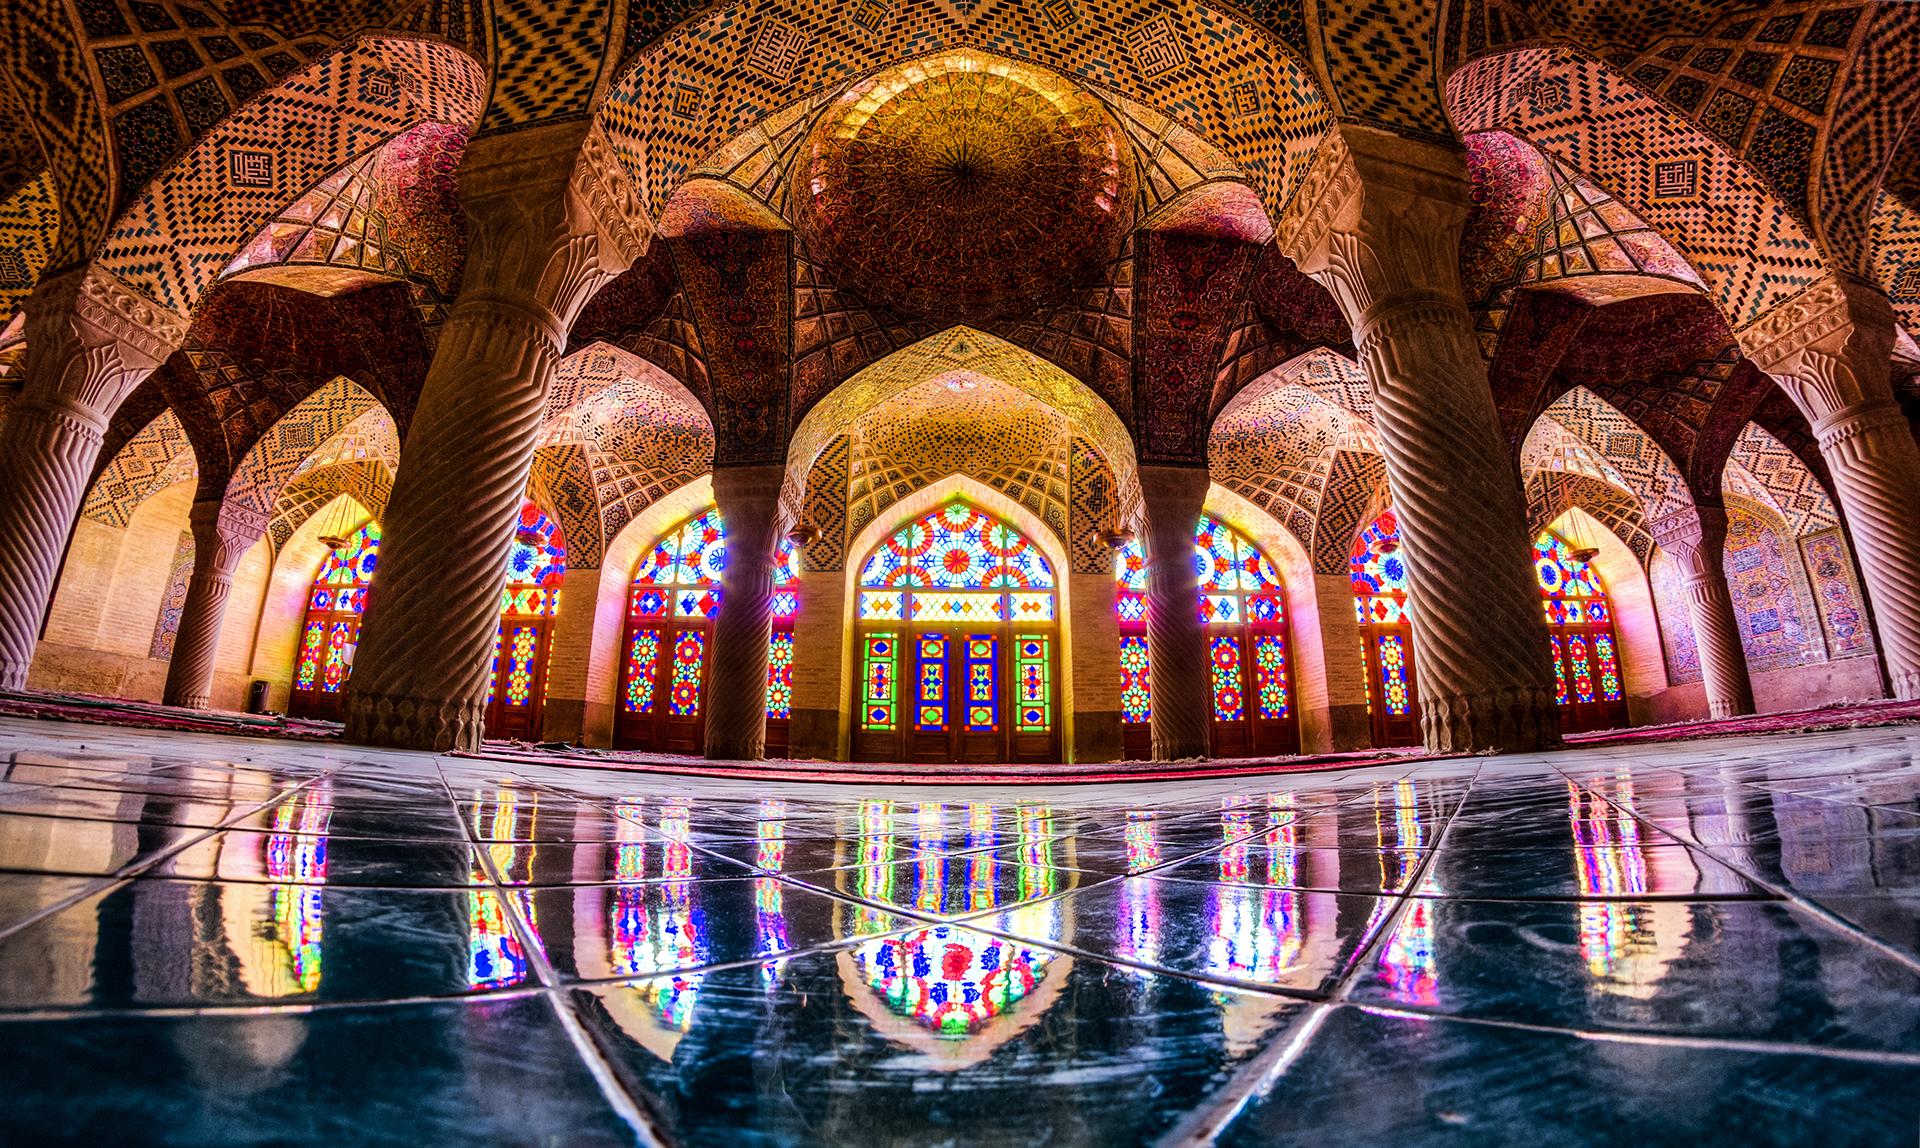 Réverbérations lumière mosquée chiite Nasir-ol-Molk Chiraz Iran